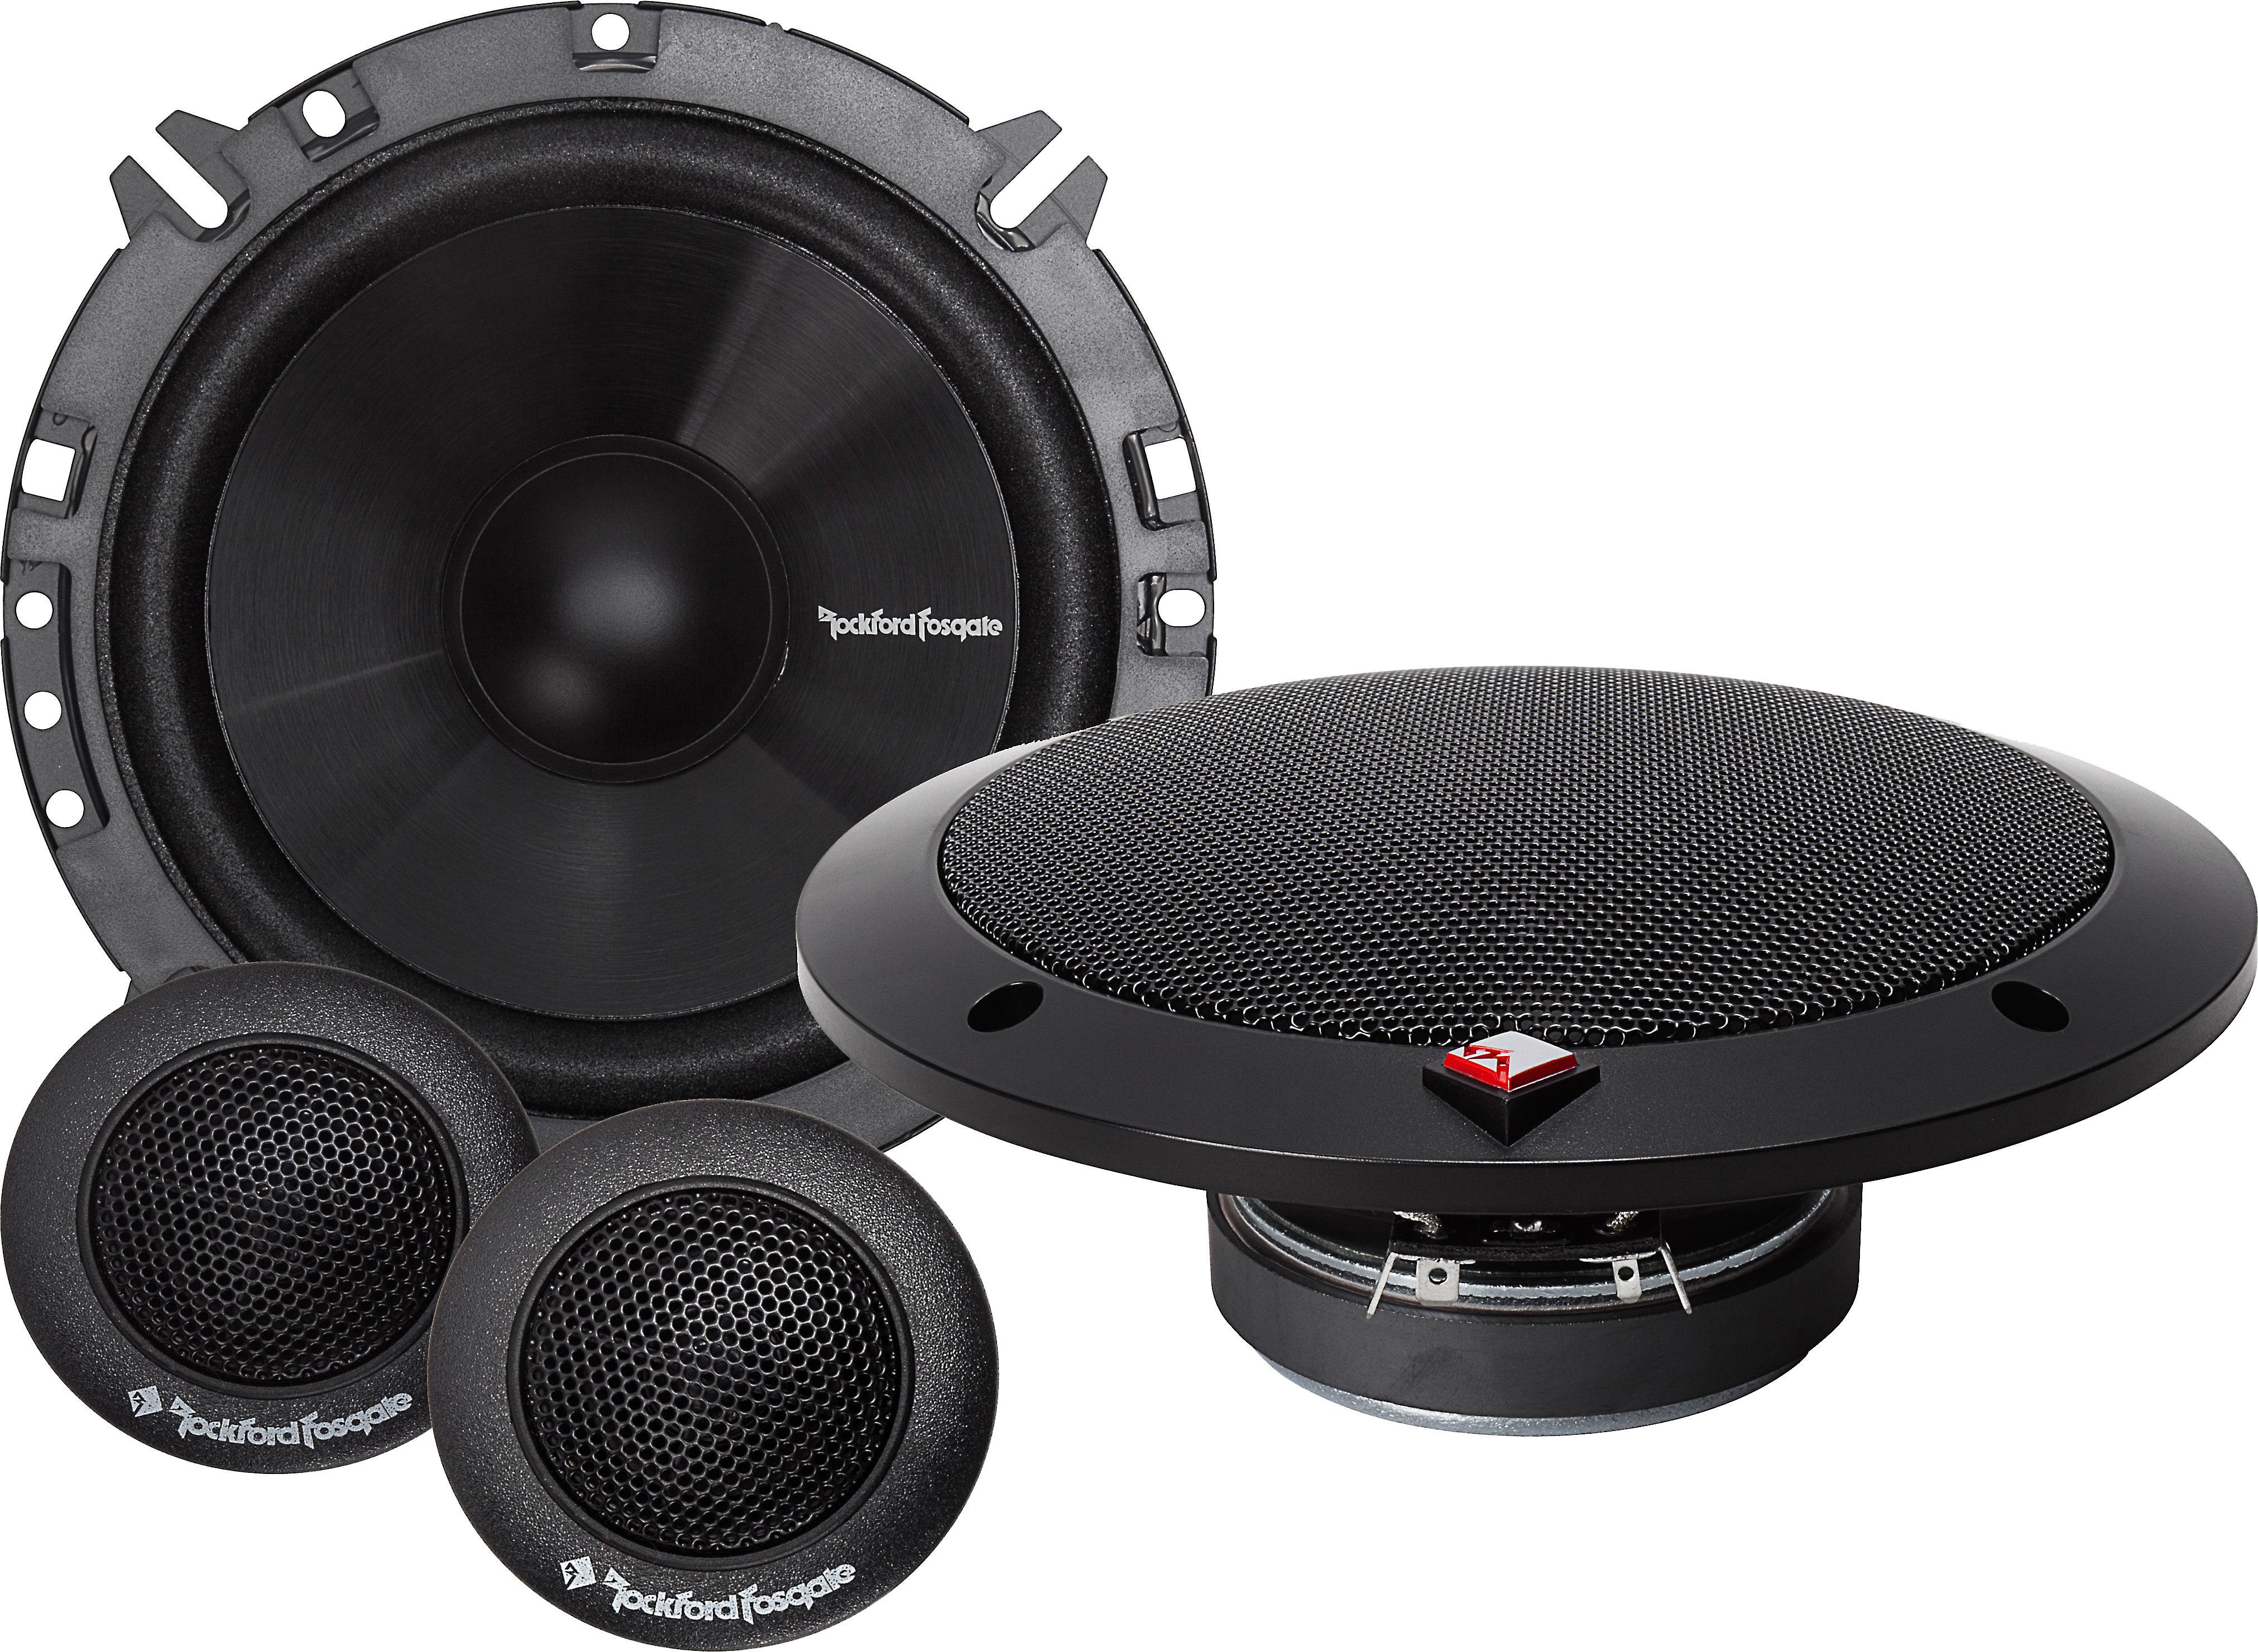 Toyota Avensis Front Door Speakers Pioneer car speakers /& adapter ring pods 300W